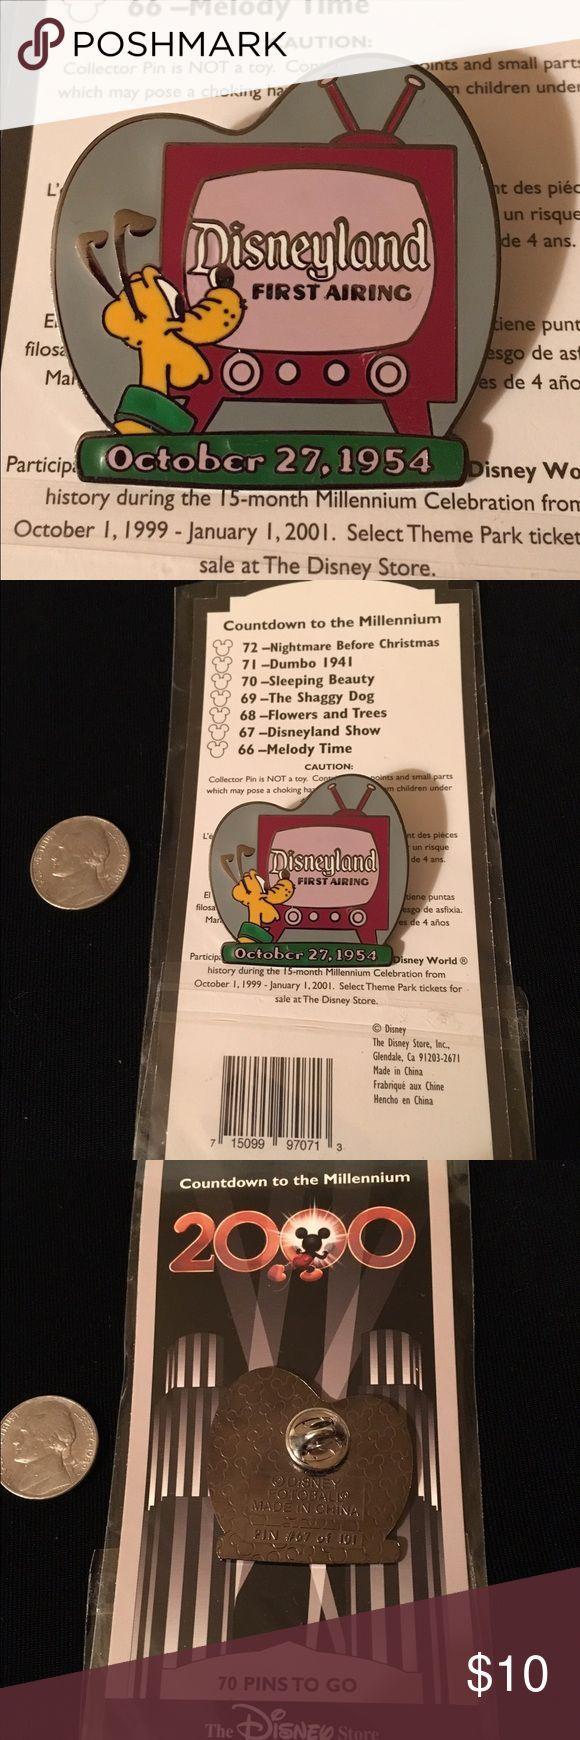 Disney Store Countdown to the Millennium Pin NEW in Original Packaging. Disneyland Show 1954 #67 Disney Jewelry